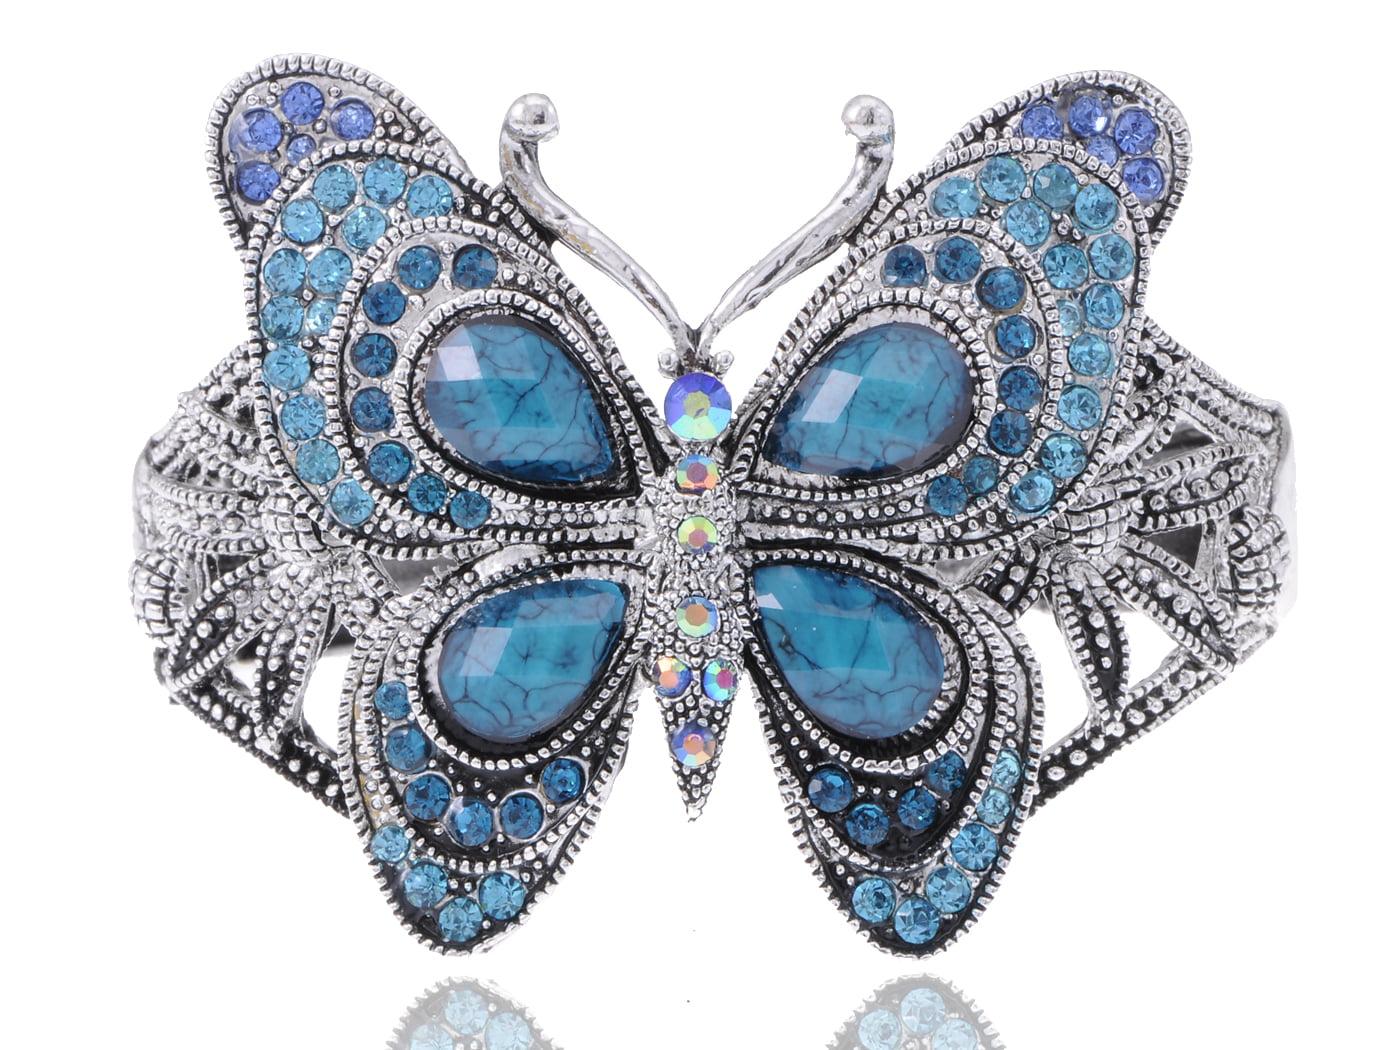 Pretty Blue Faux Turquoise Swarovski Elements Butterfly Cuff Bangle Bracelet by